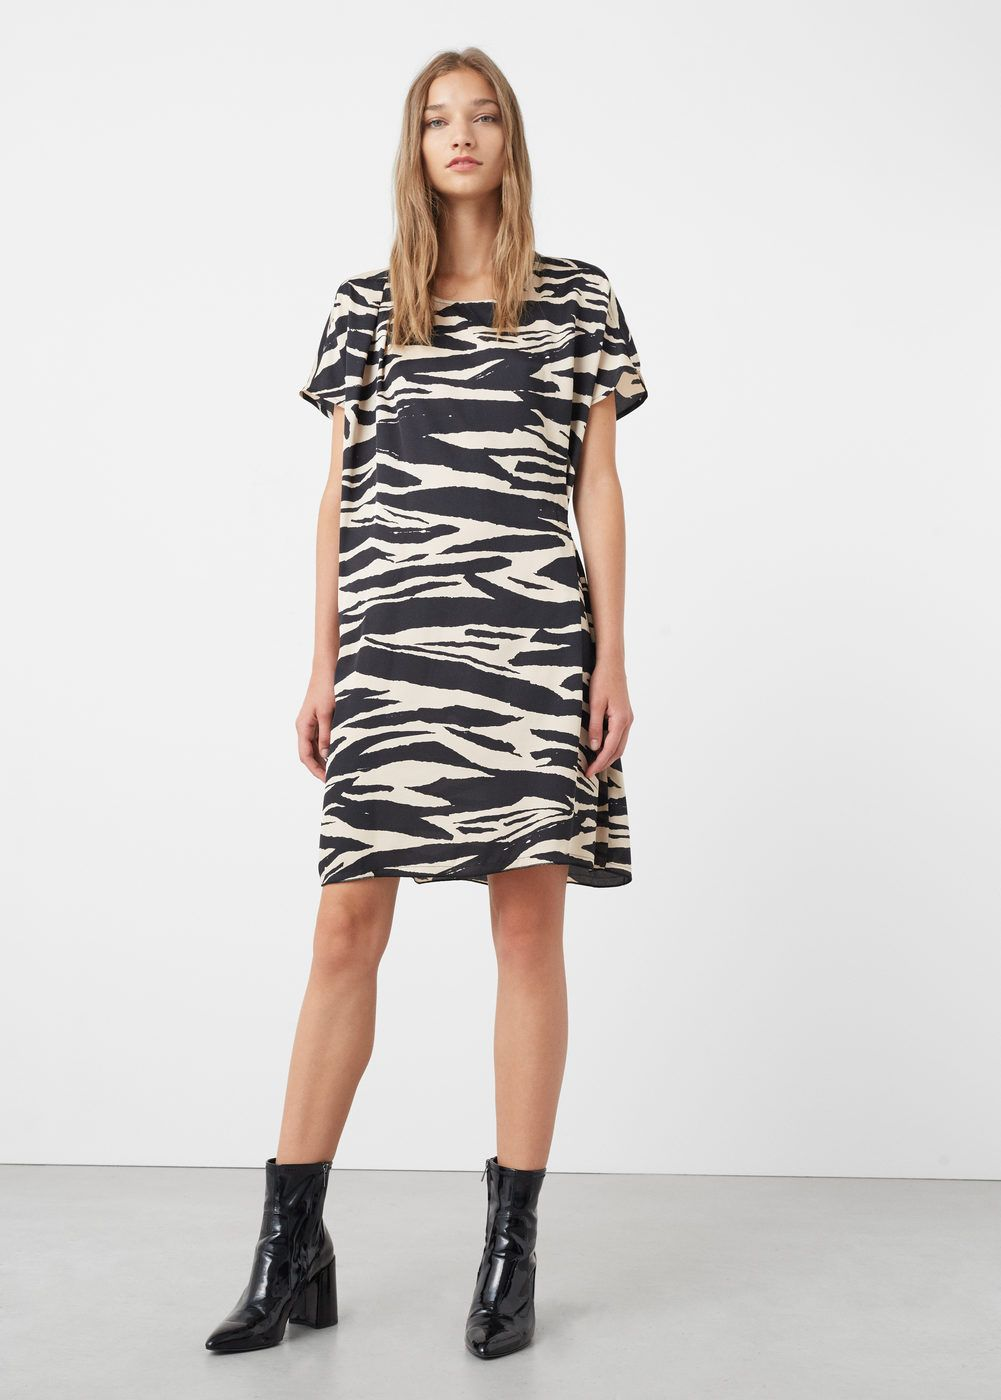 Animal print dress - Women | dress | Pinterest | Animal print ...